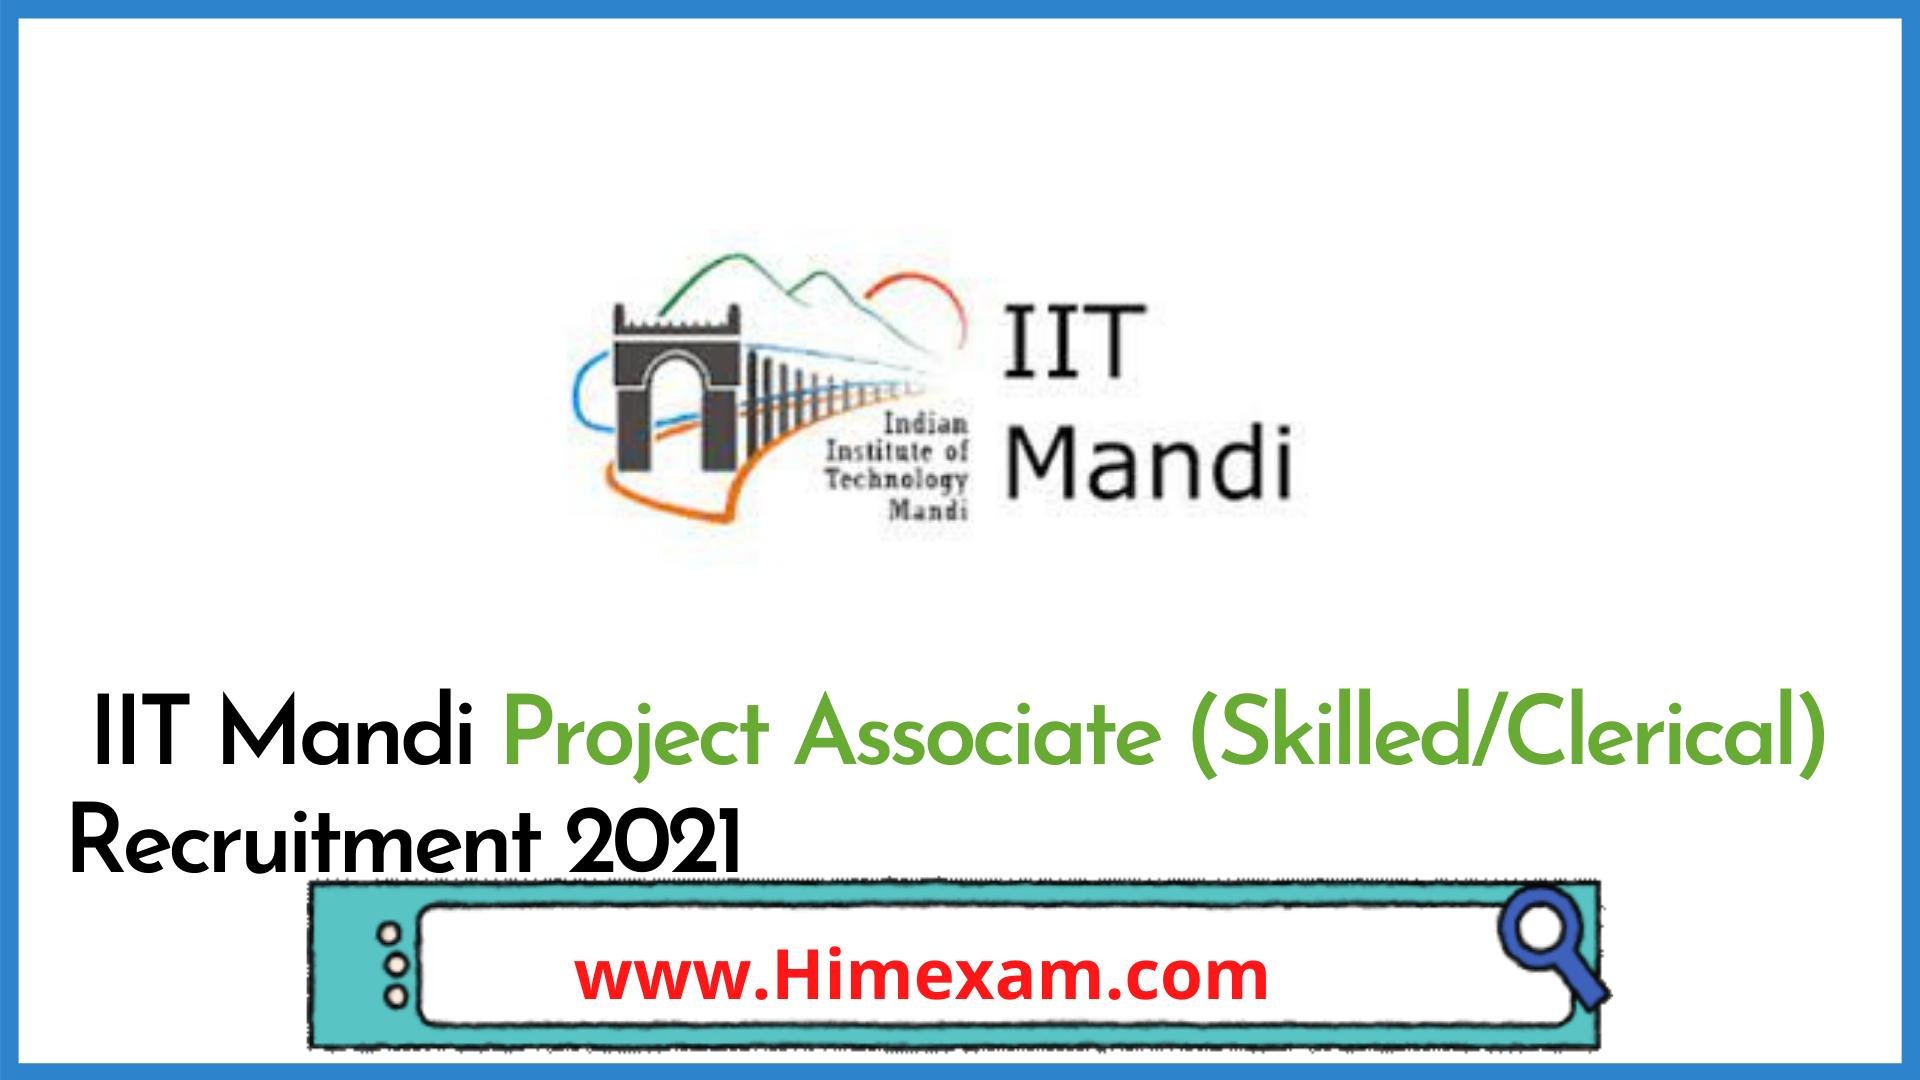 IIT Mandi Project Associate (Skilled/Clerical) Recruitment 2021